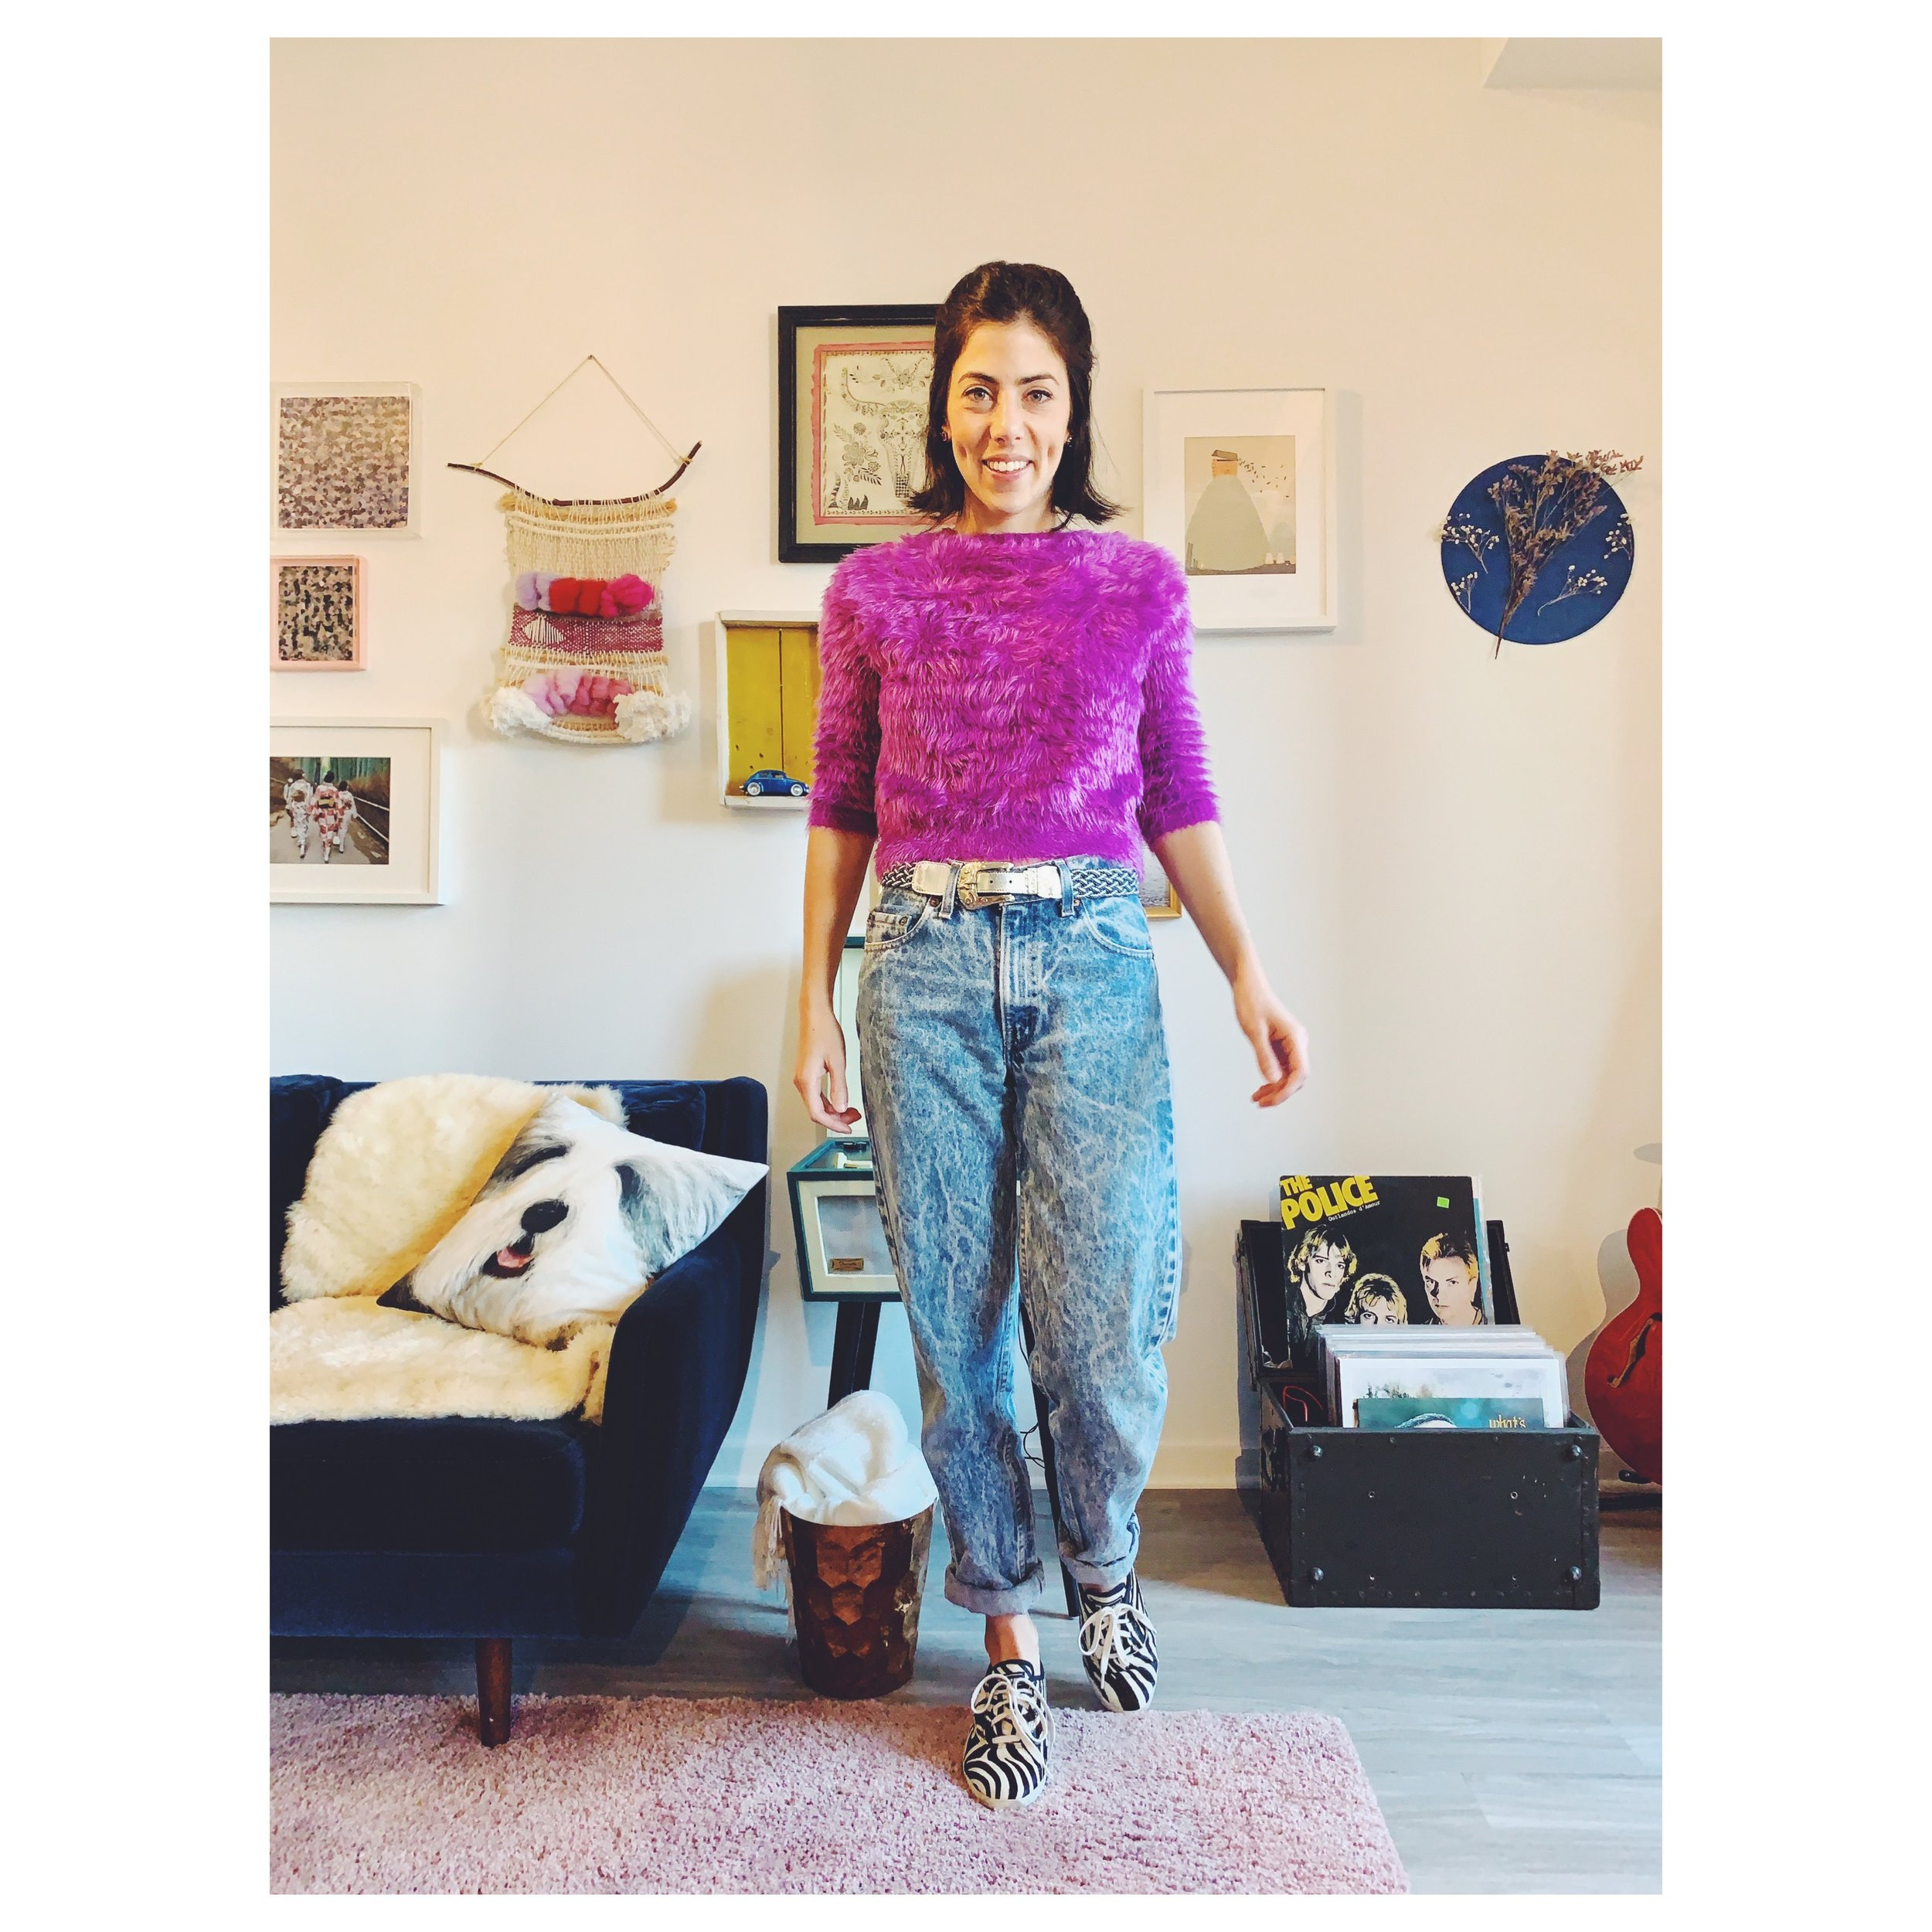 Blusa rosa pelinho - Instagram.JPG